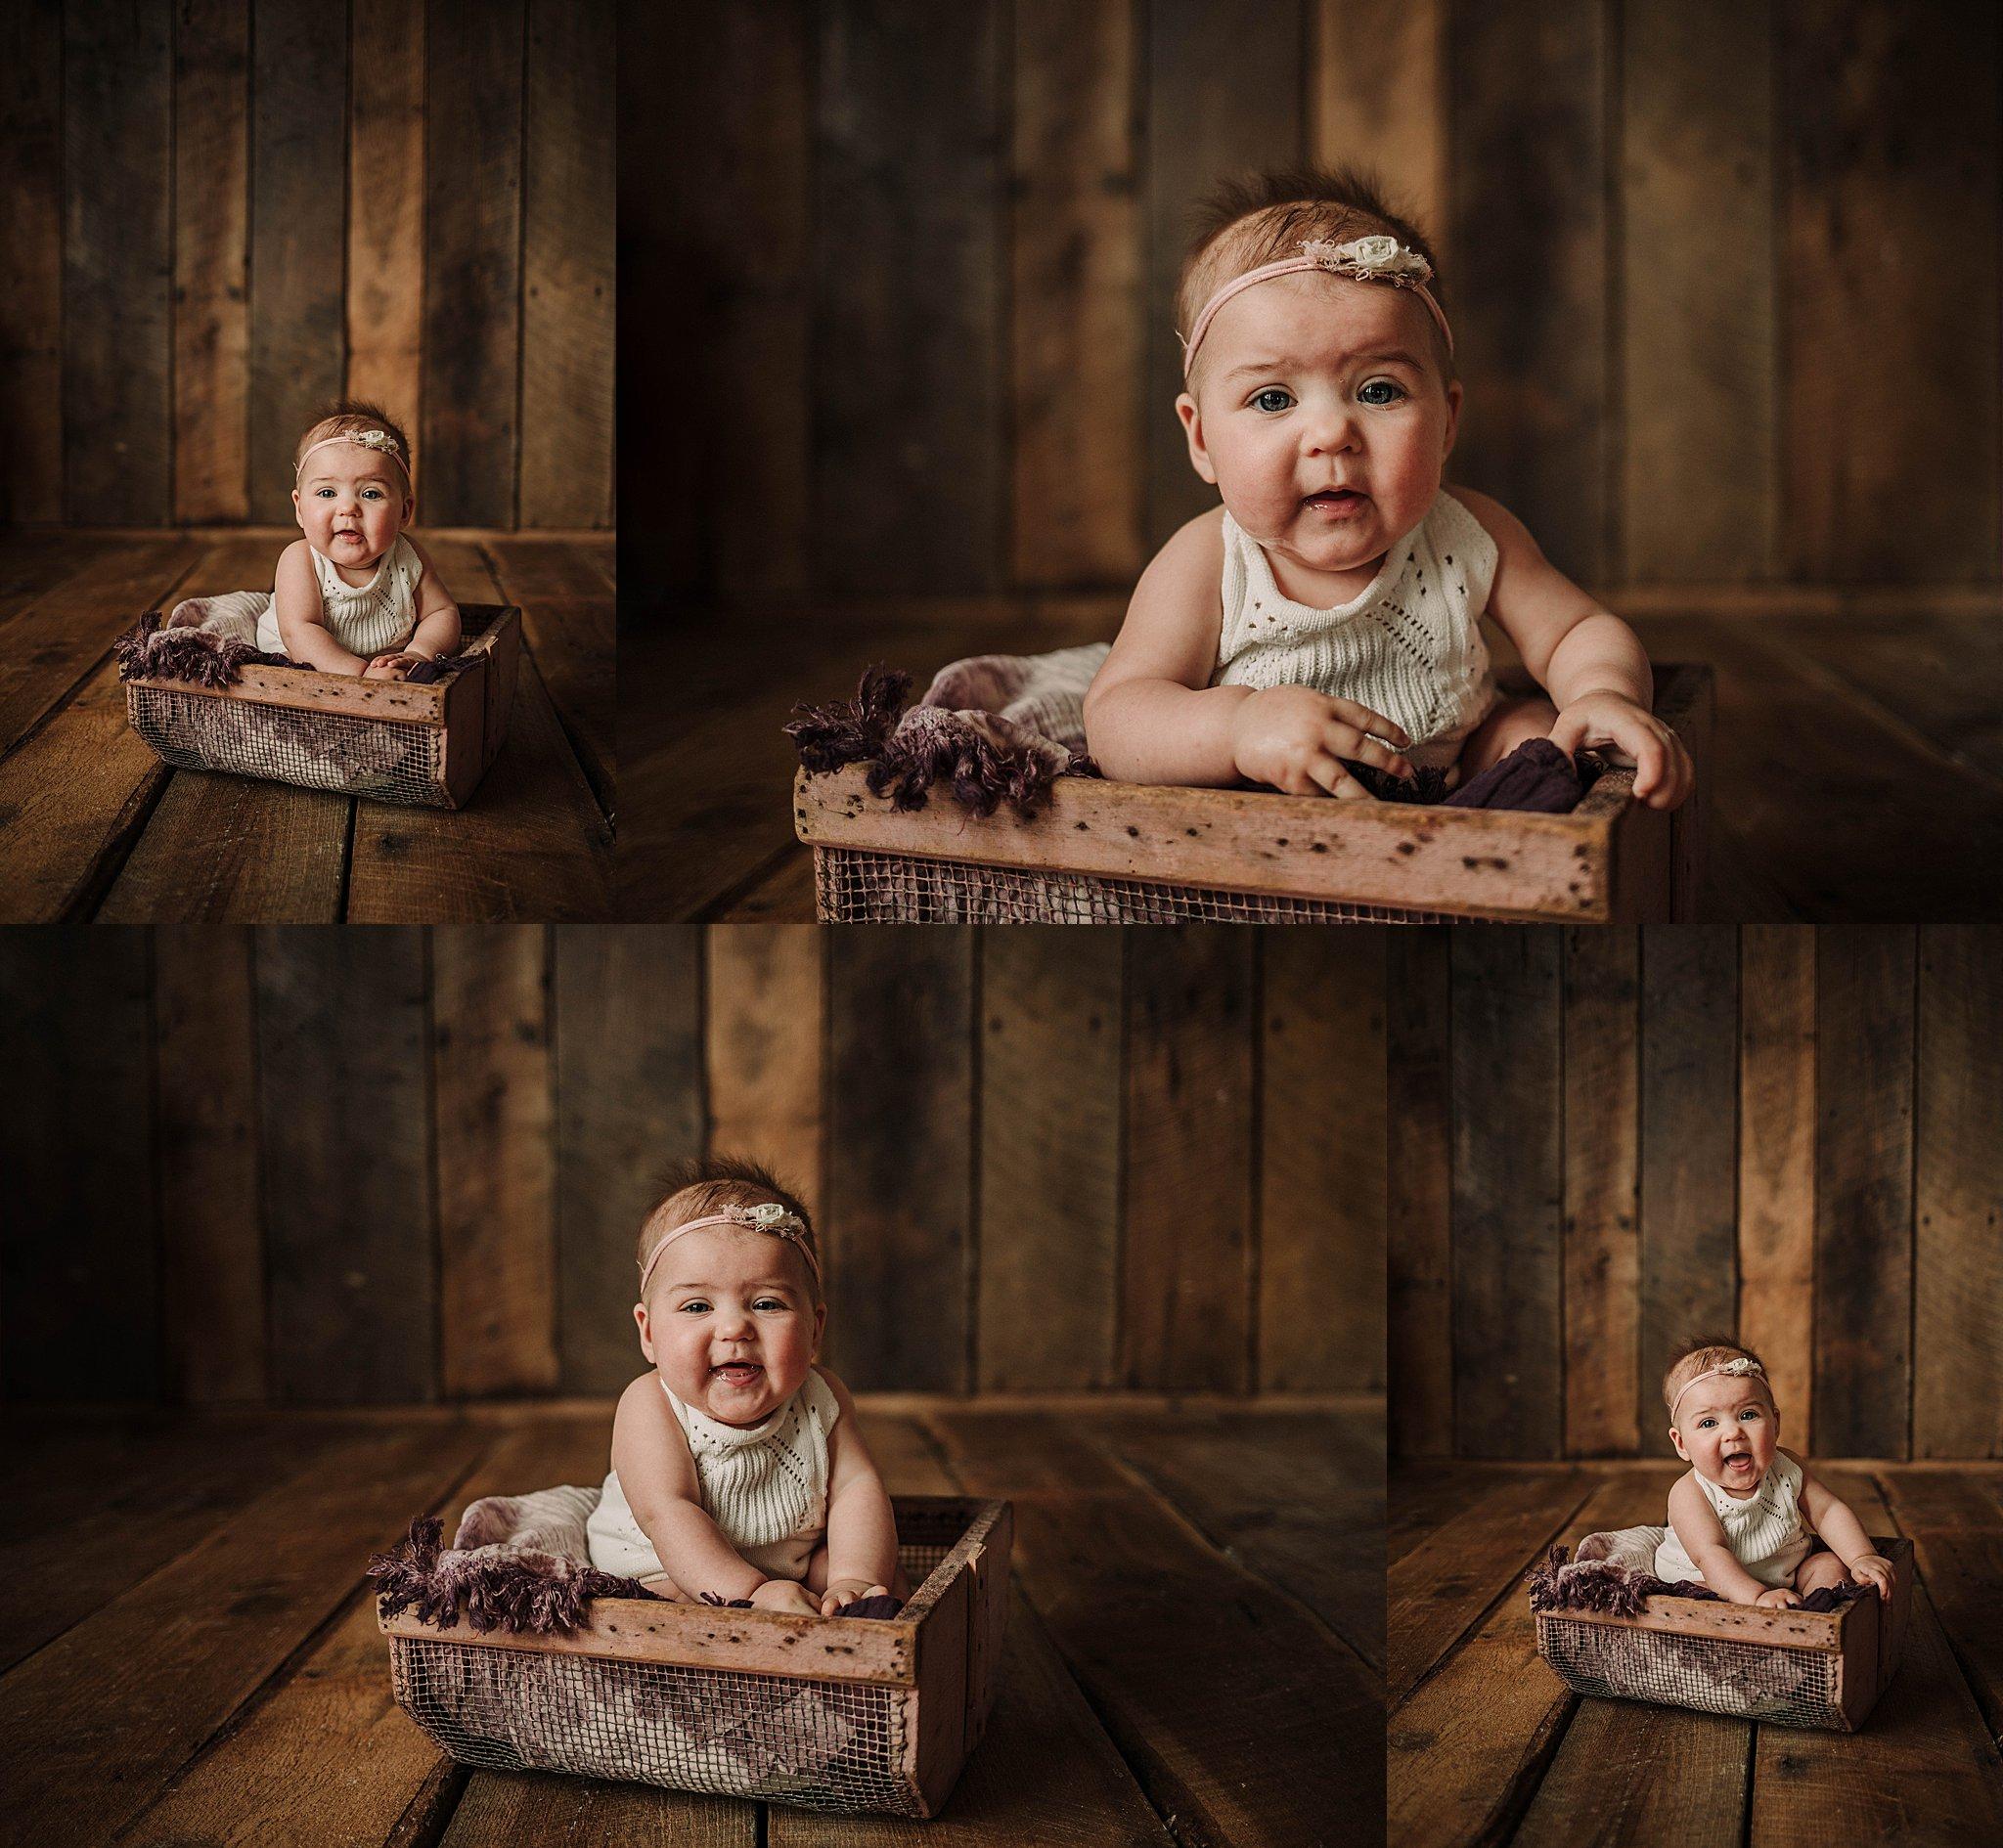 2019-03-11_baby-photographer-lebanon-rolla-missouri-basket-purple-2.jpg